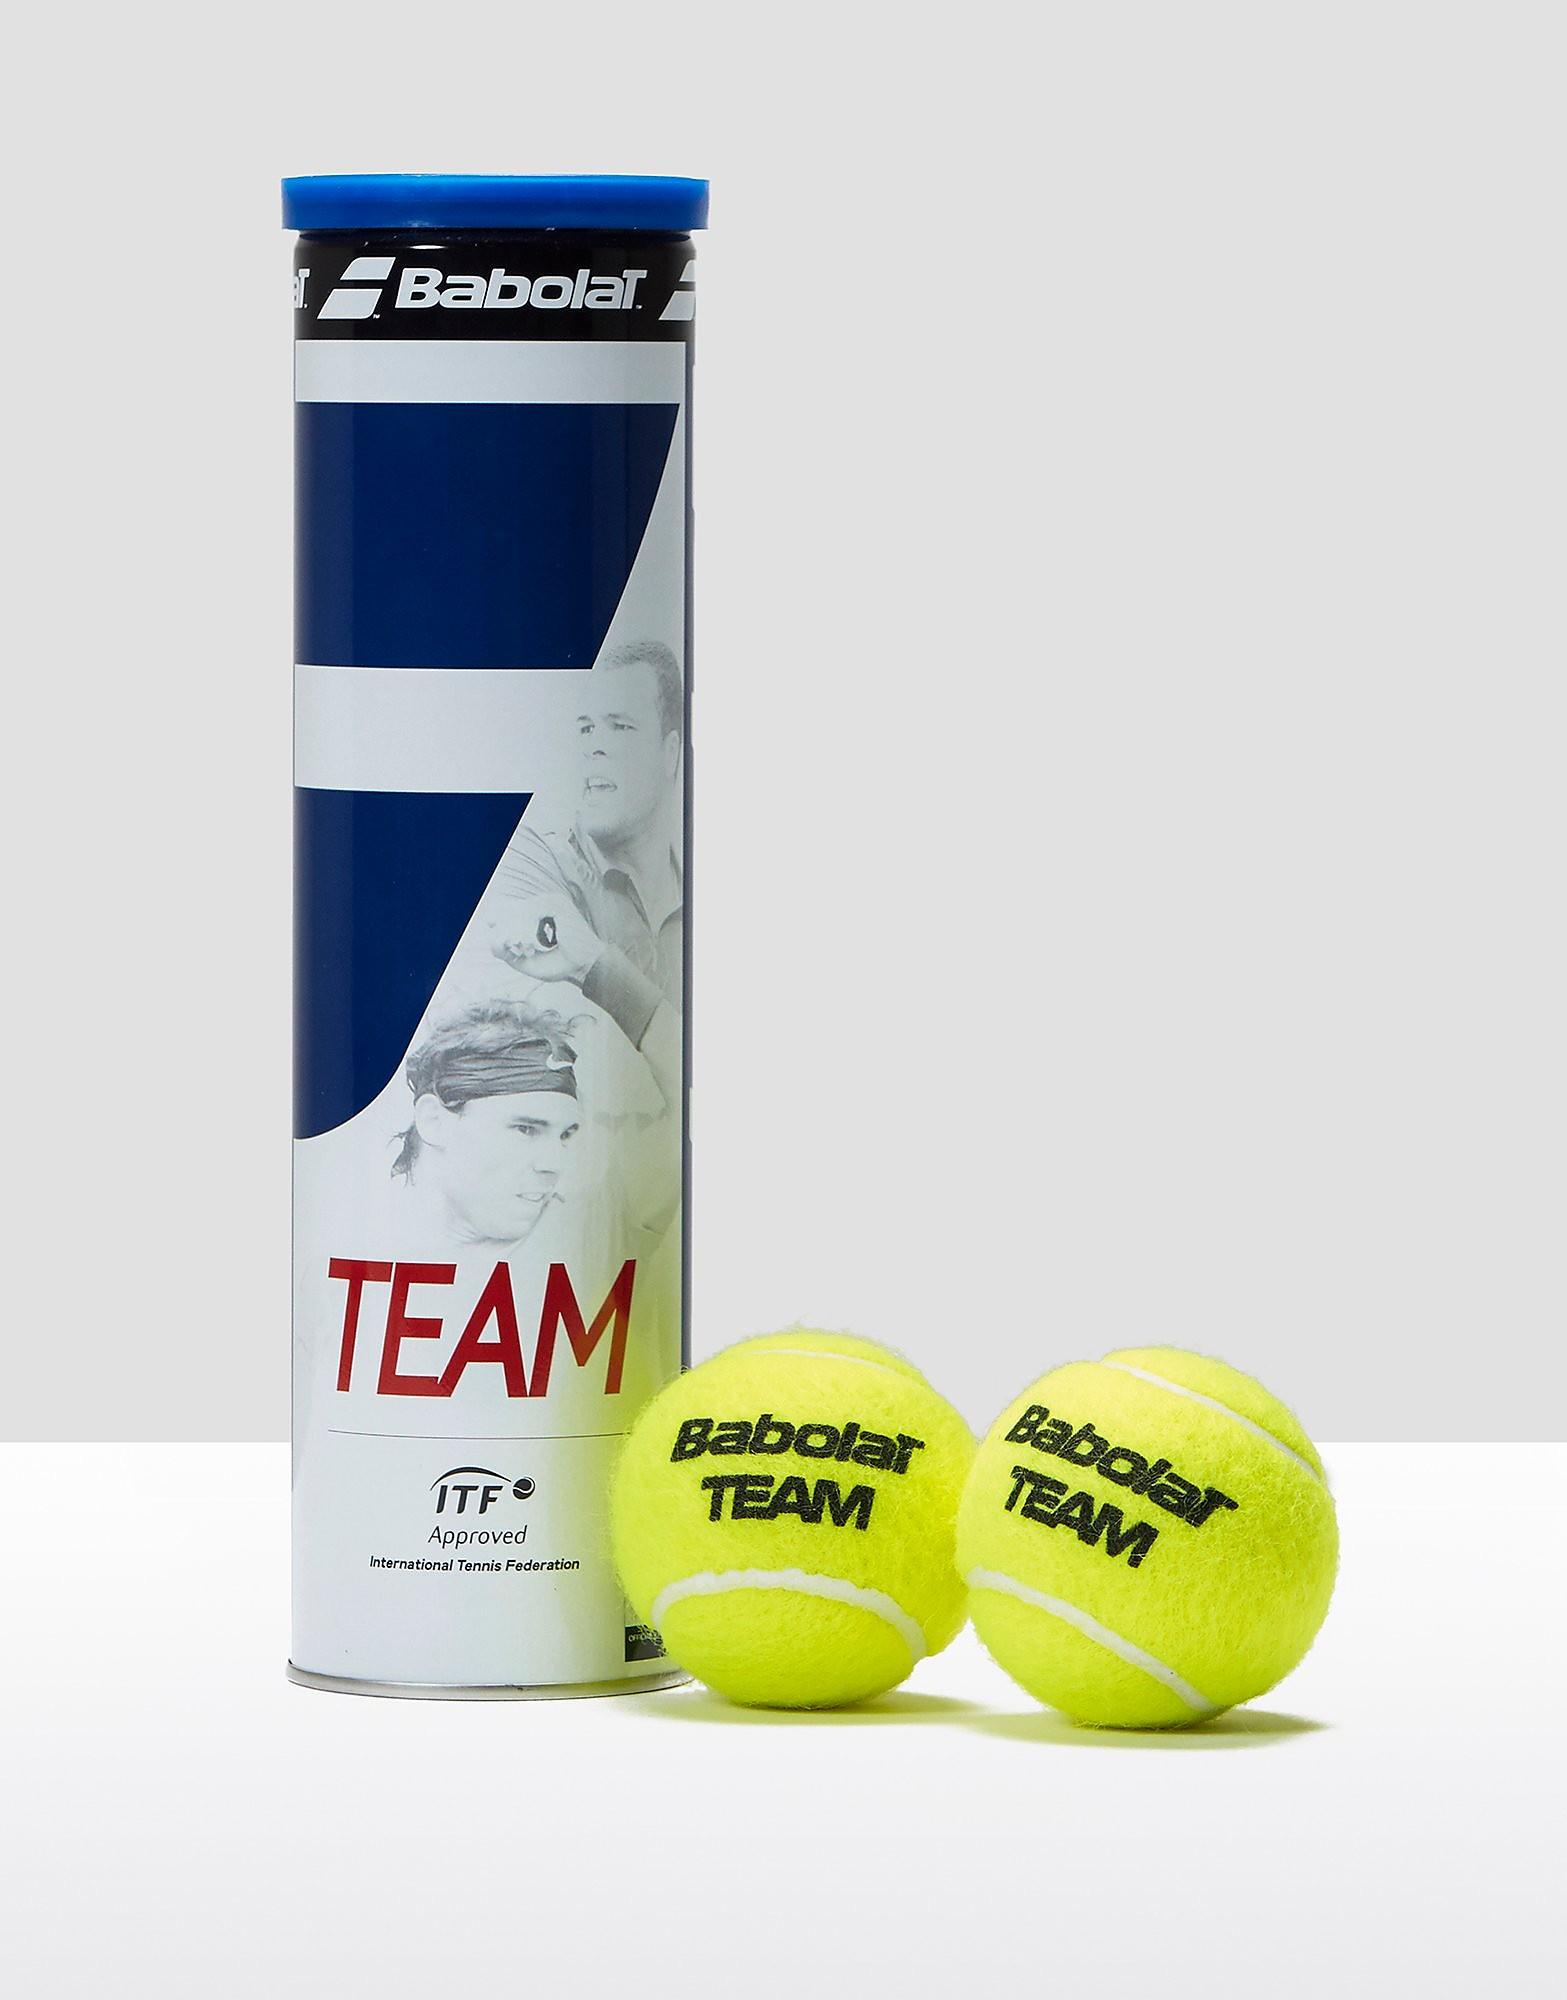 Babolat Team Tennis Balls - 4 Ball Can